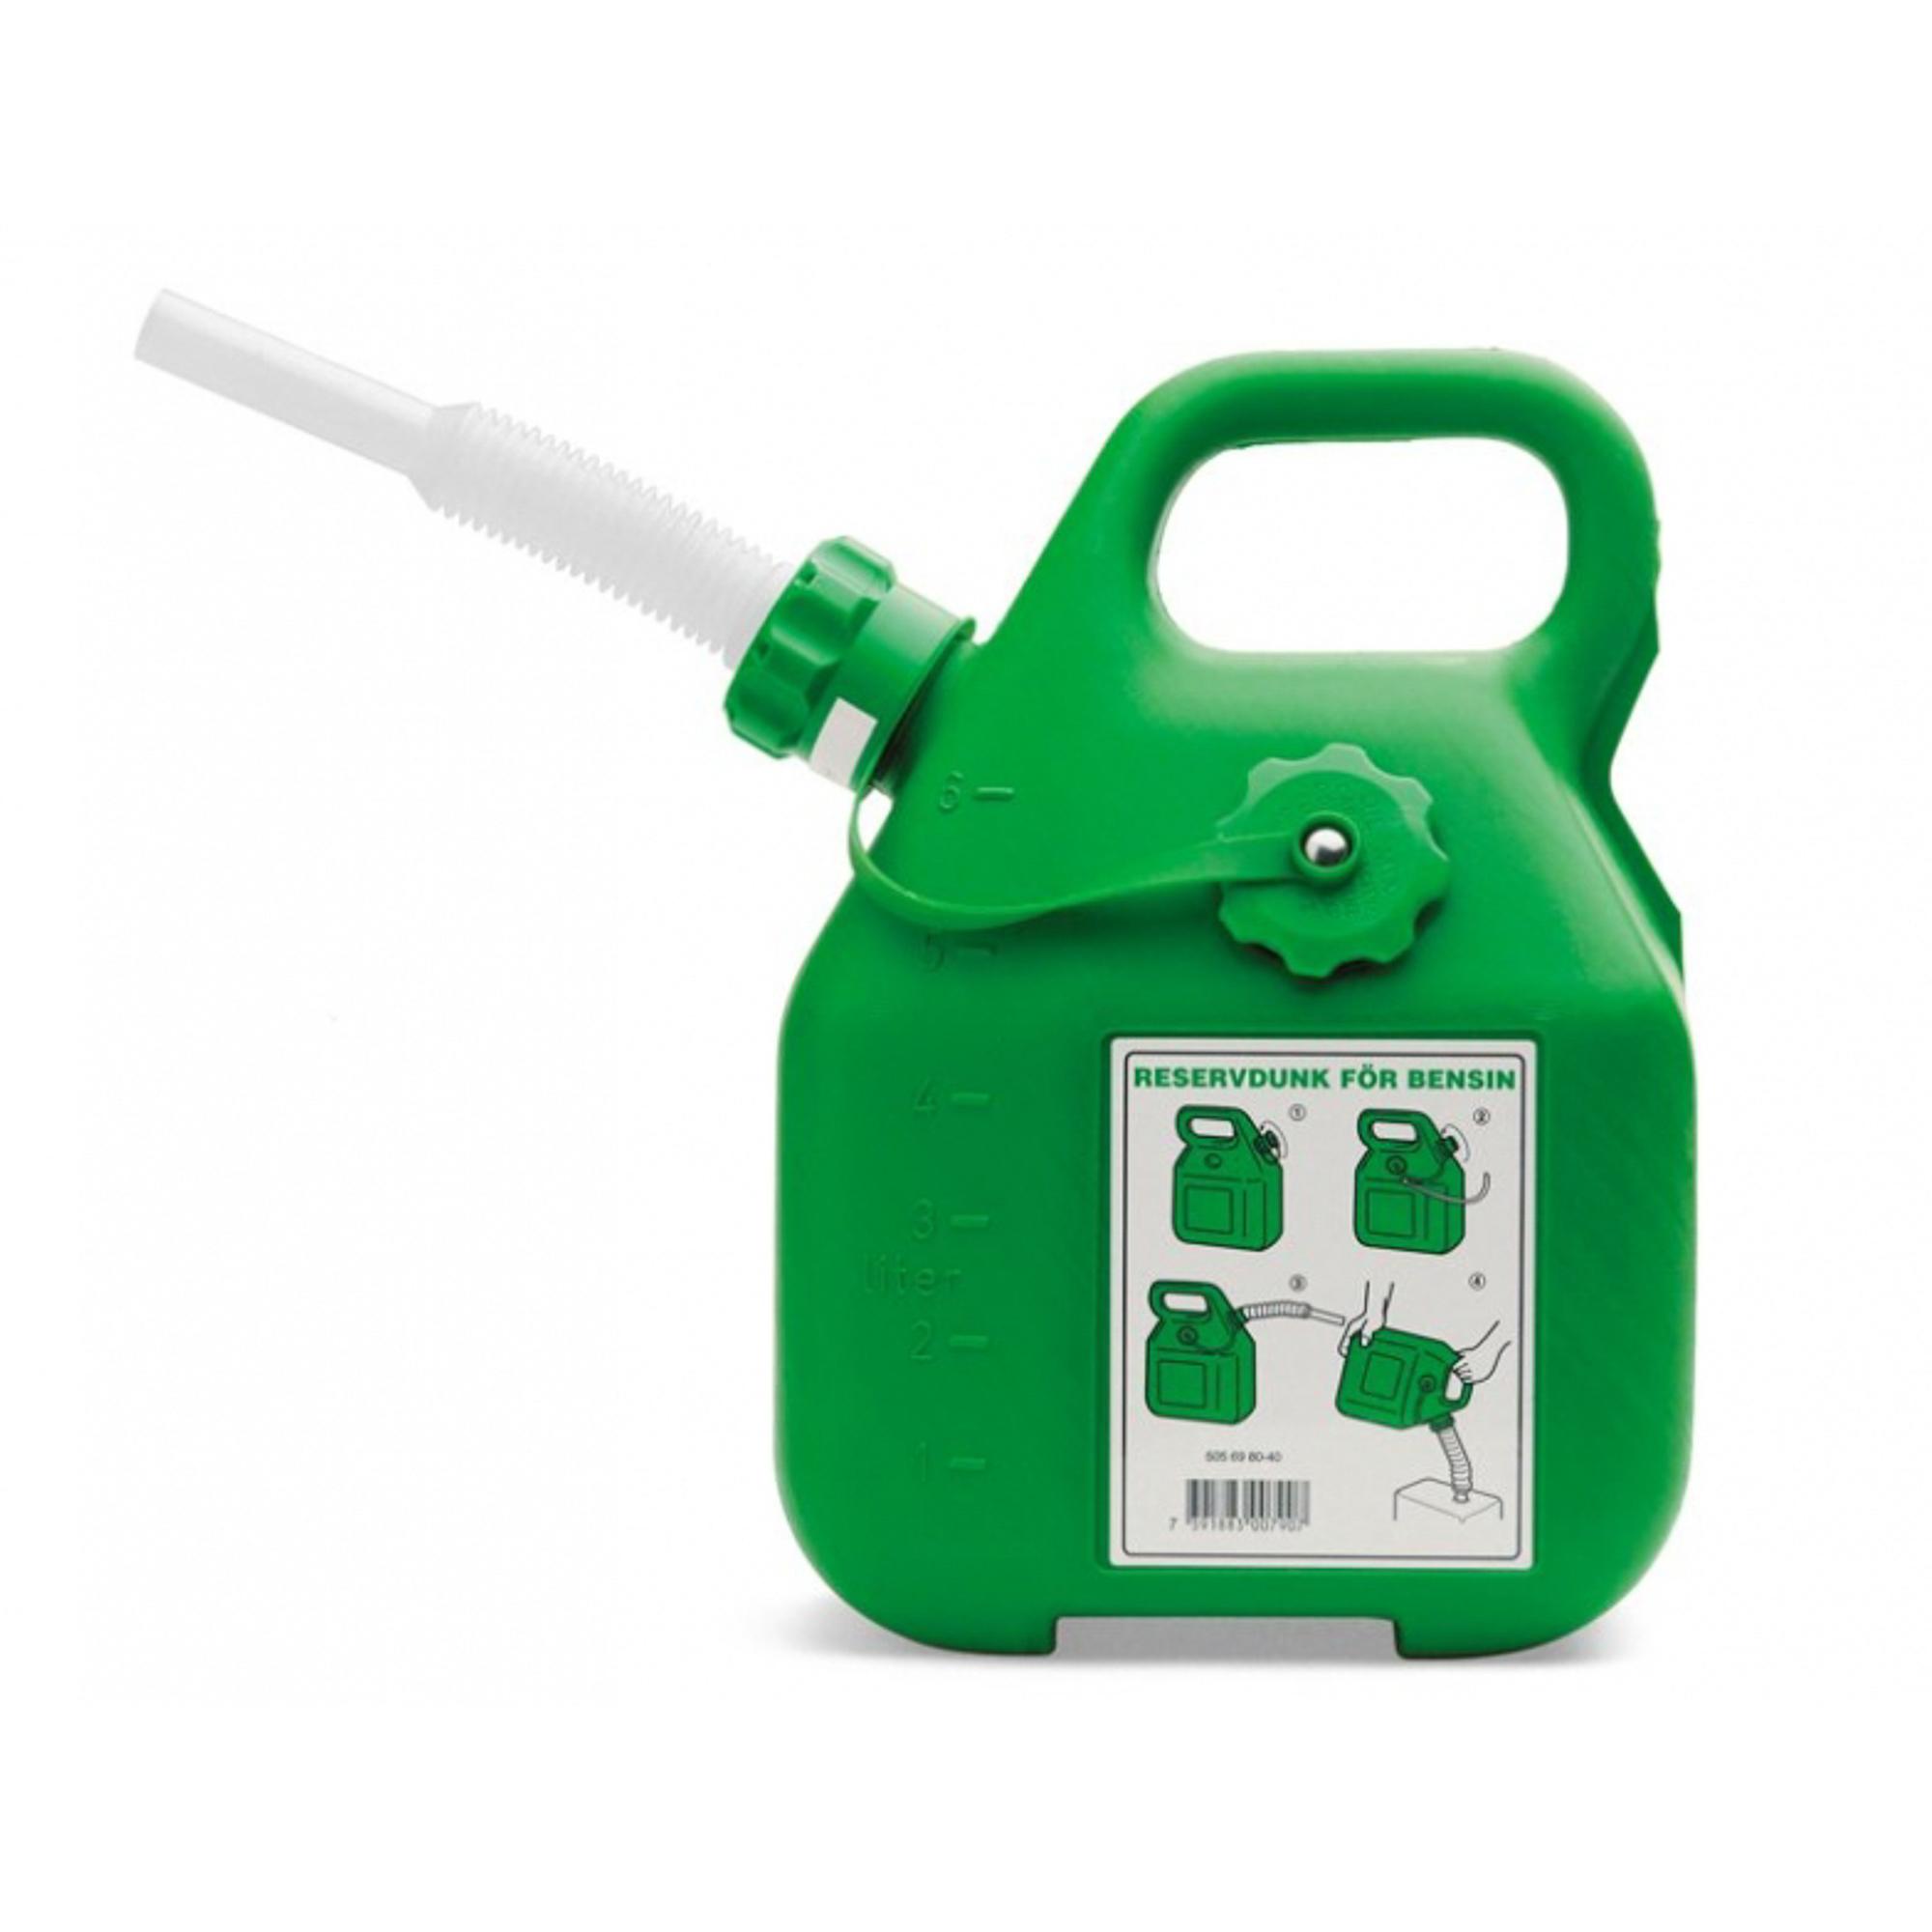 Канистра для бензина зеленая, 6 л Husqvarna